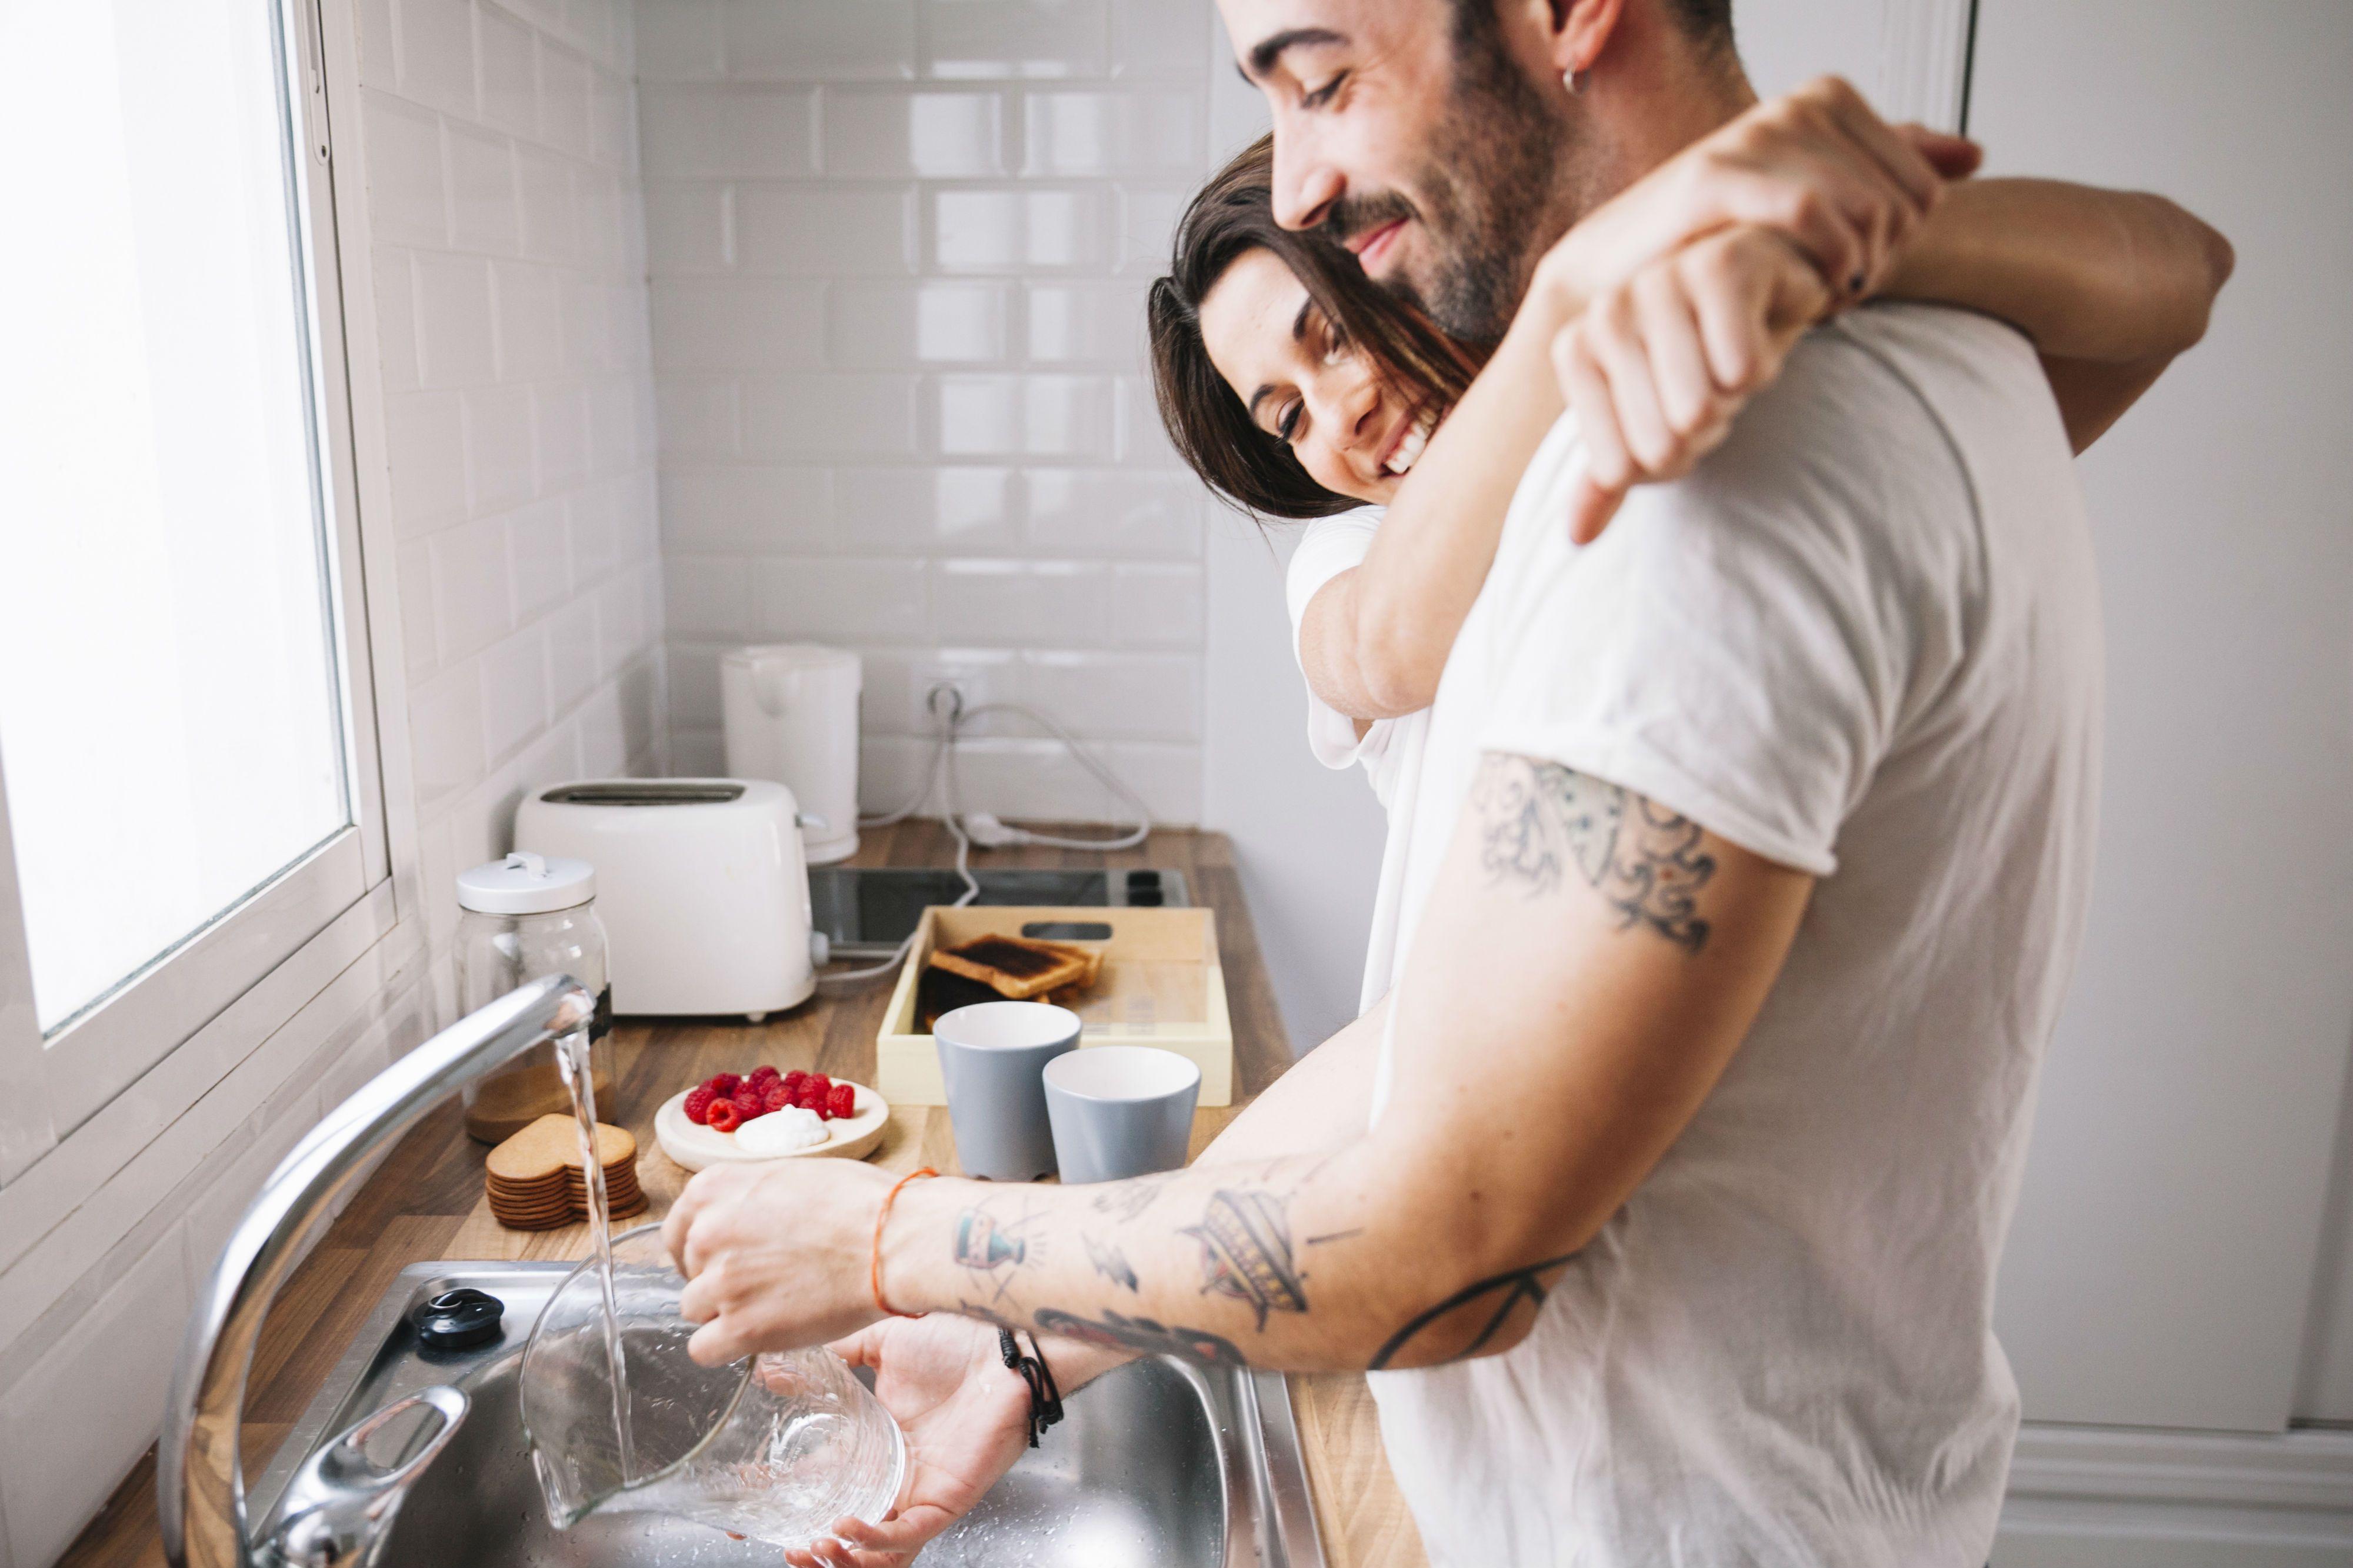 картинка муж моет посуду обновила перечень